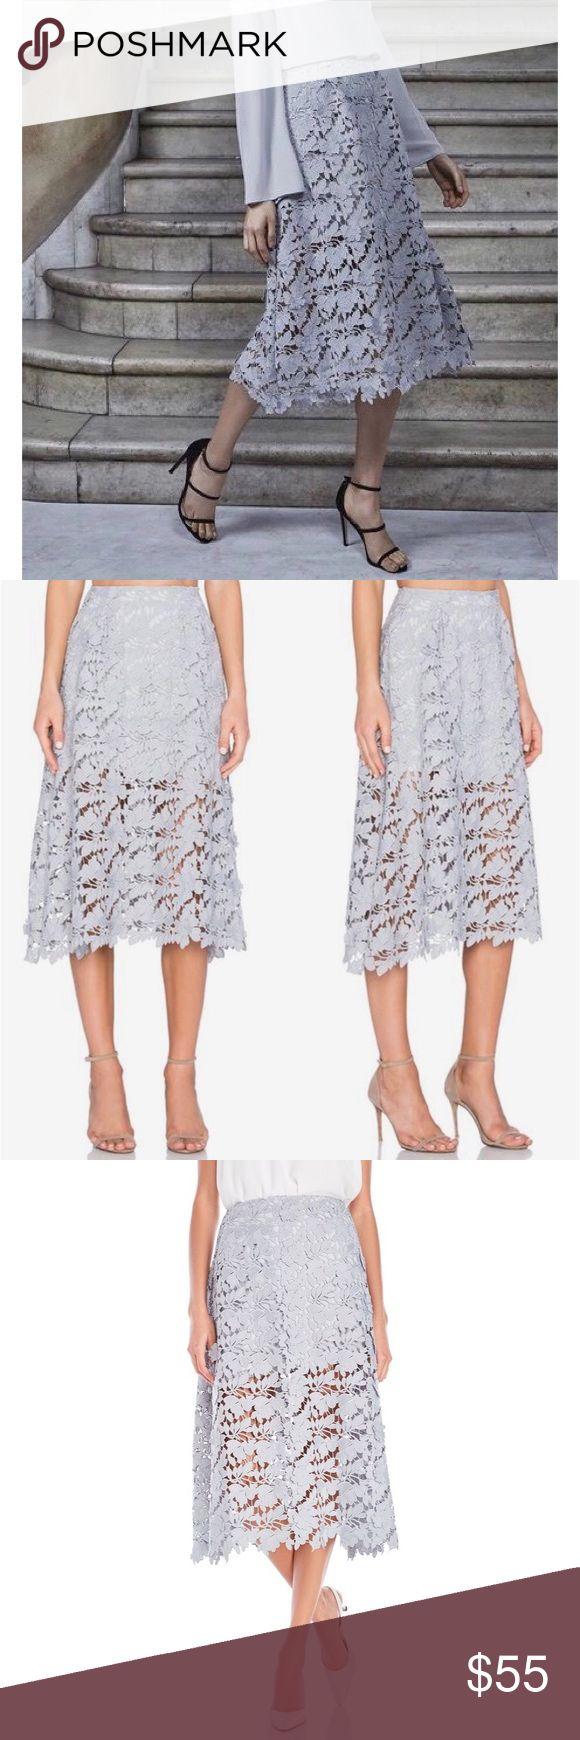 Keepsake Lace Midi Skirt Beautiful powder blue lace midi skirt. Shorter under skirt. Back exposed zipper. 100% Polyester. Worn once. KEEPSAKE the Label Skirts Midi